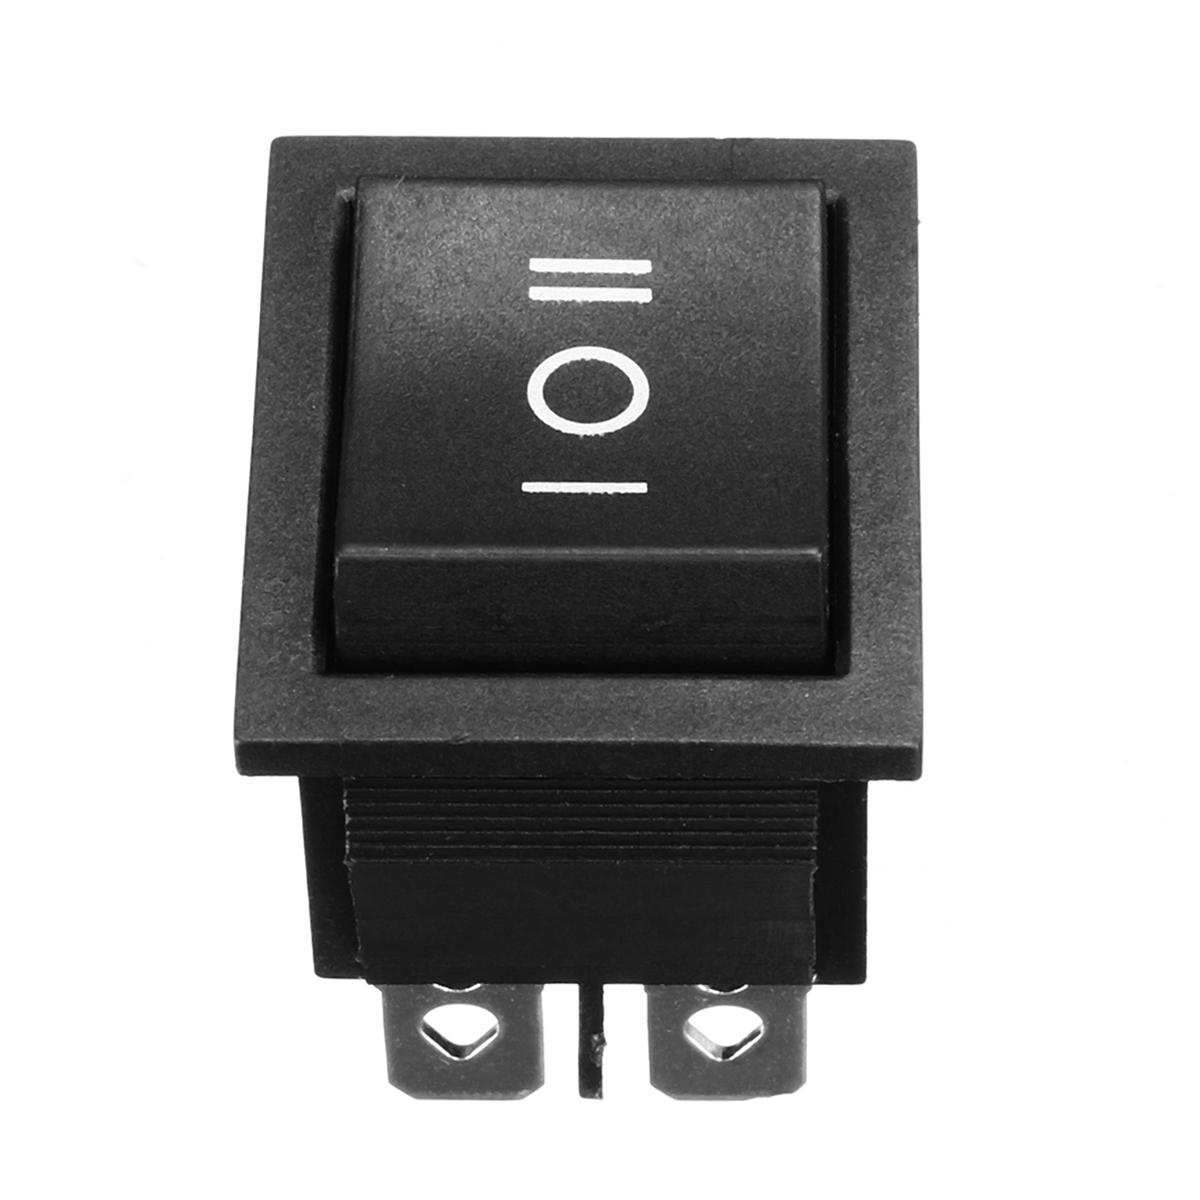 250V AC 6 Pin 3 Position Rocker Switch Hoist Boat ON-OFF-ON Push Button Switch